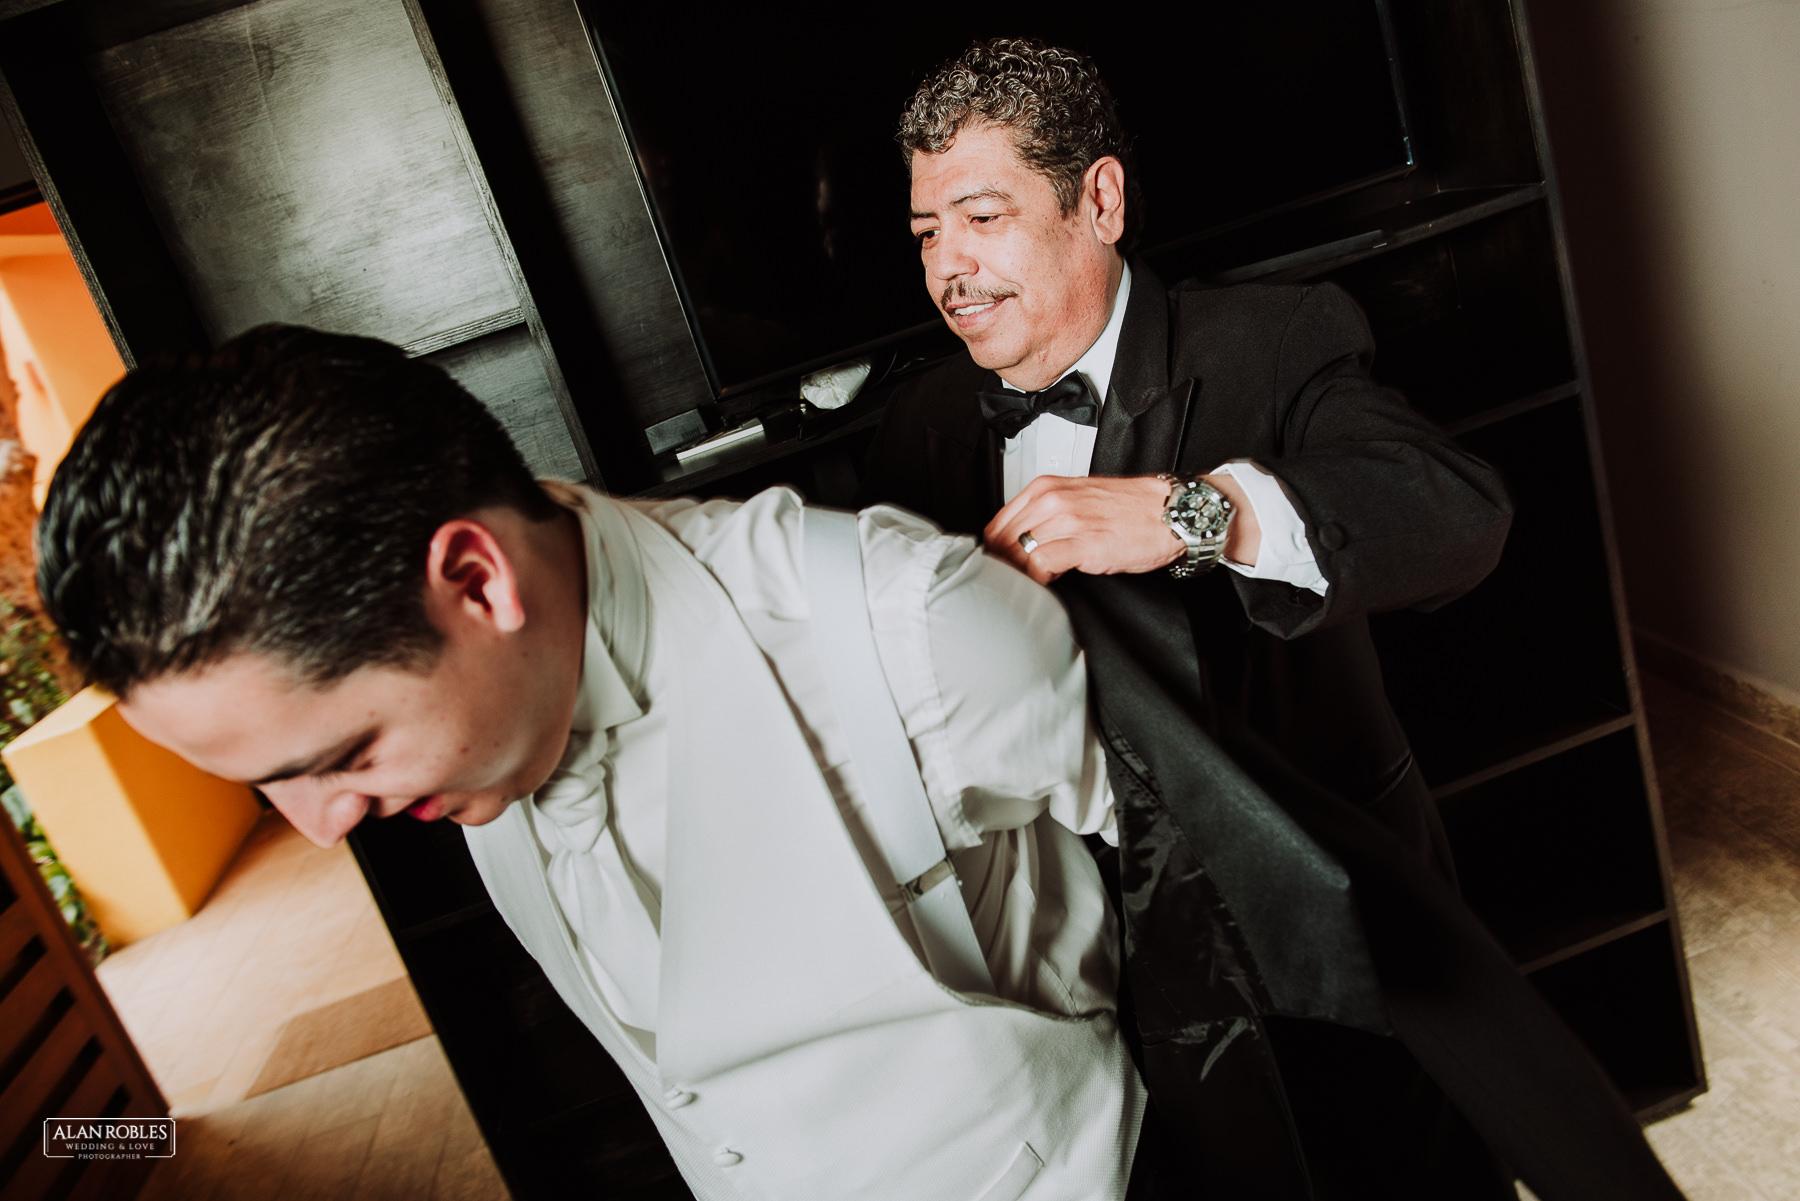 Alan Robles fotografo de bodas guadalajara - LyP Hotel Demetria-34